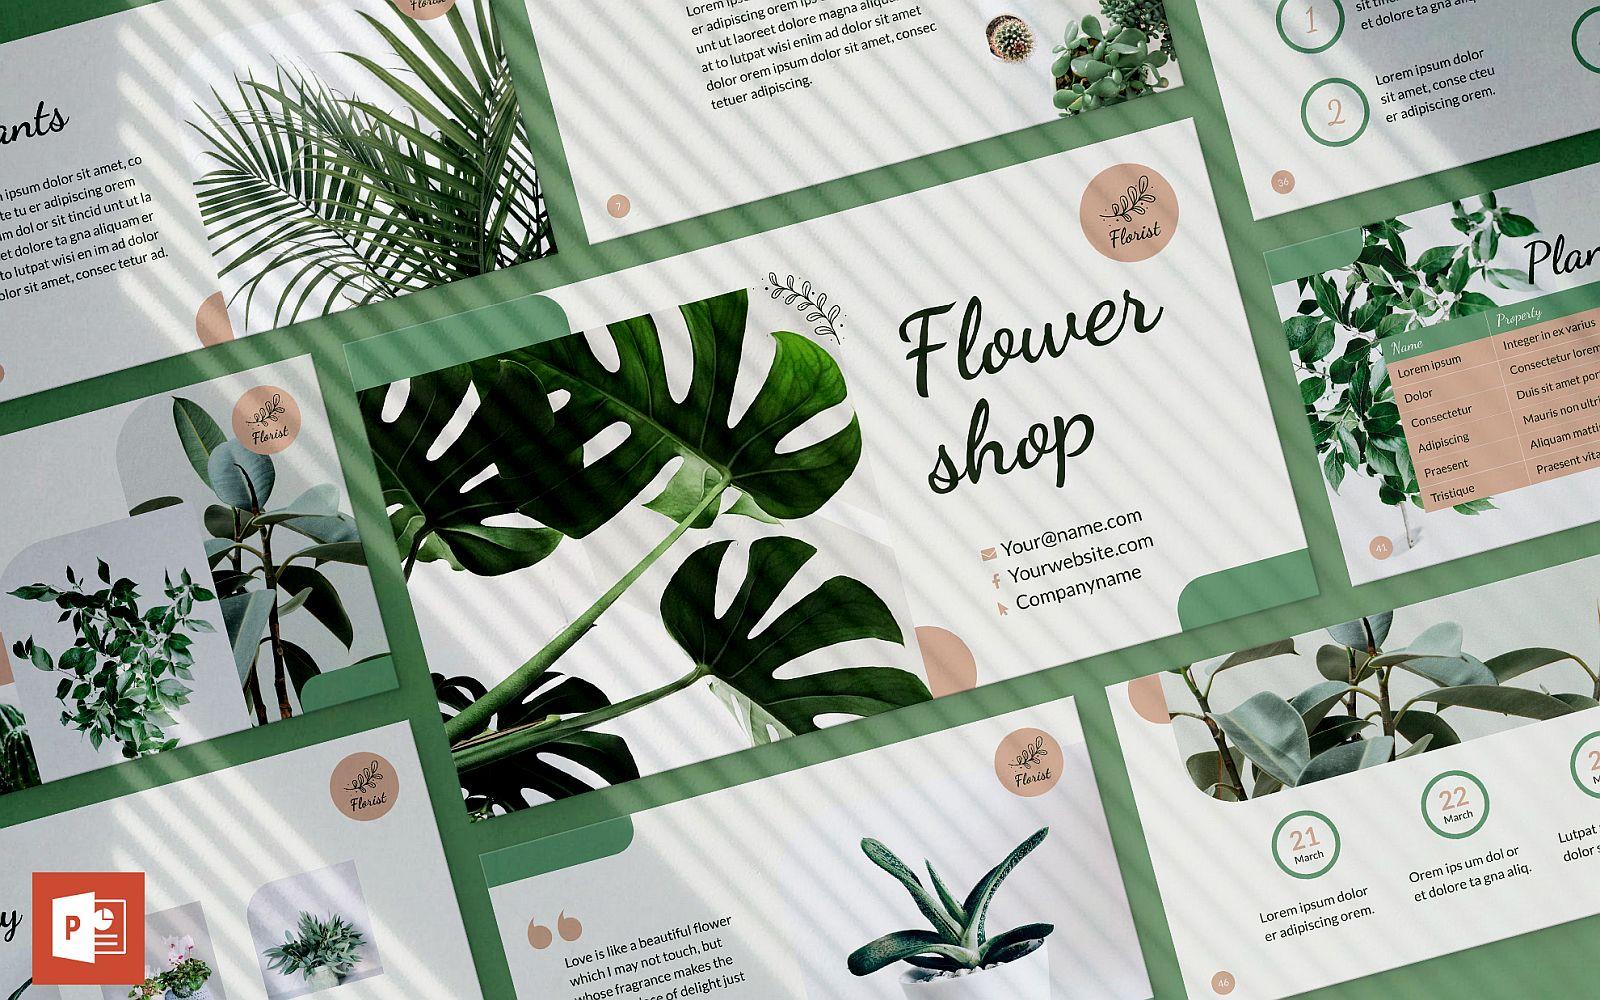 Flower Shop Presentation PowerPoint template